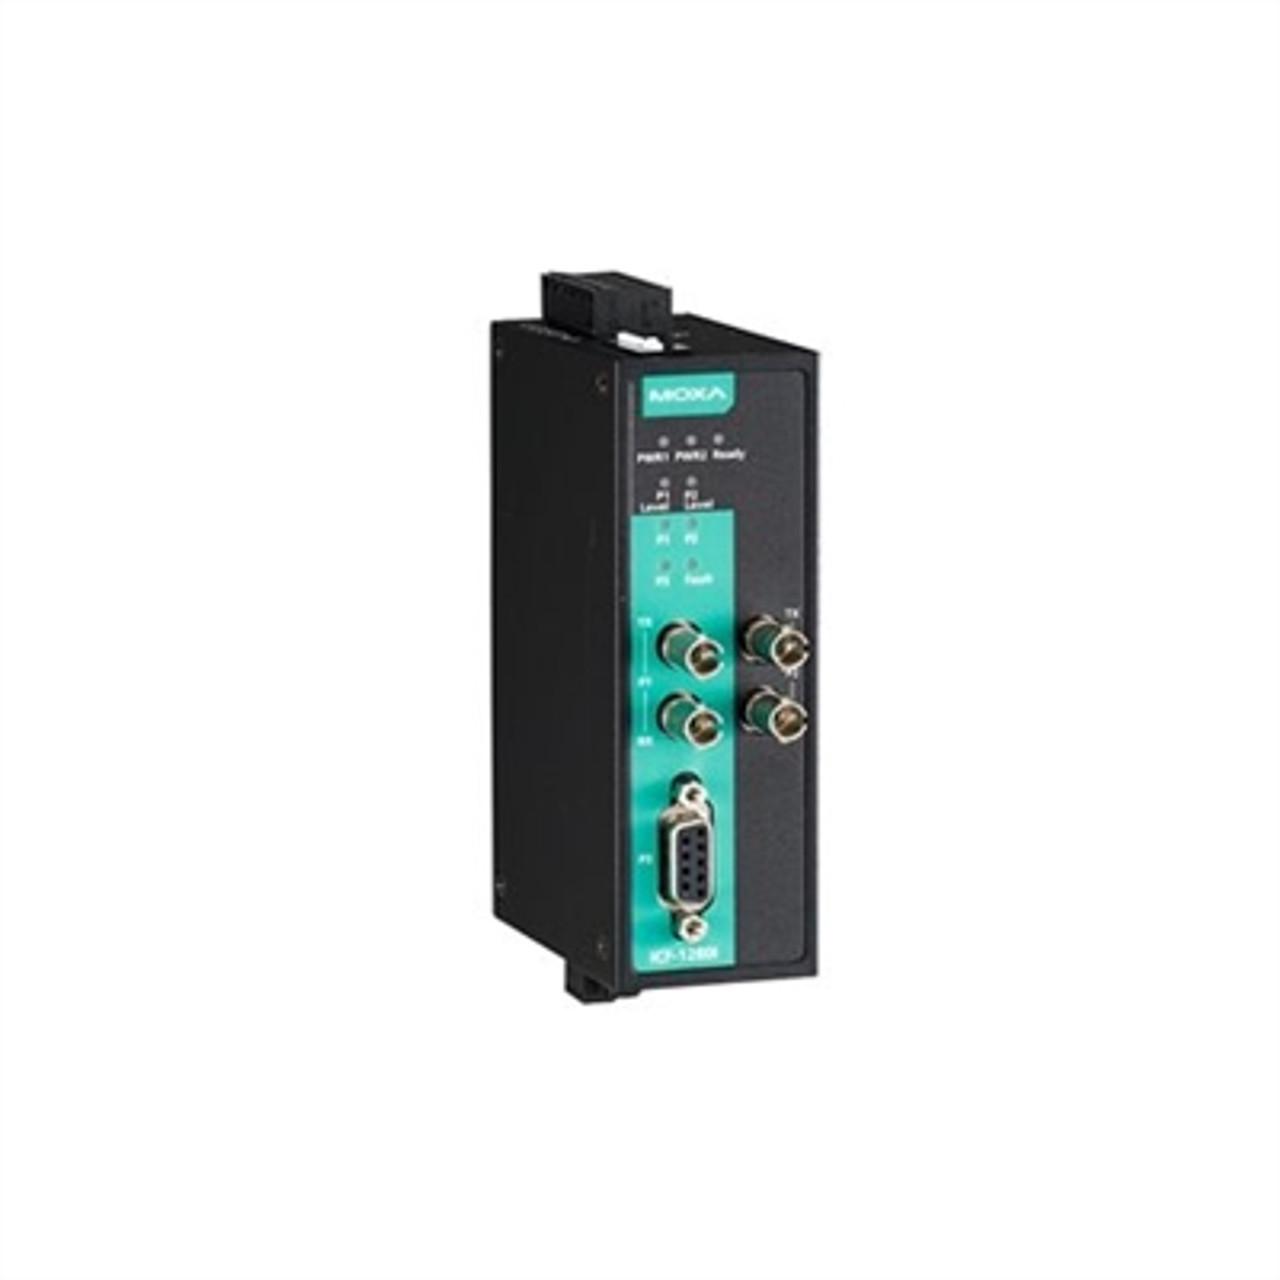 Moxa ICF-1280I-S-ST-T Industrial Profibus To Fiber Optic Converter